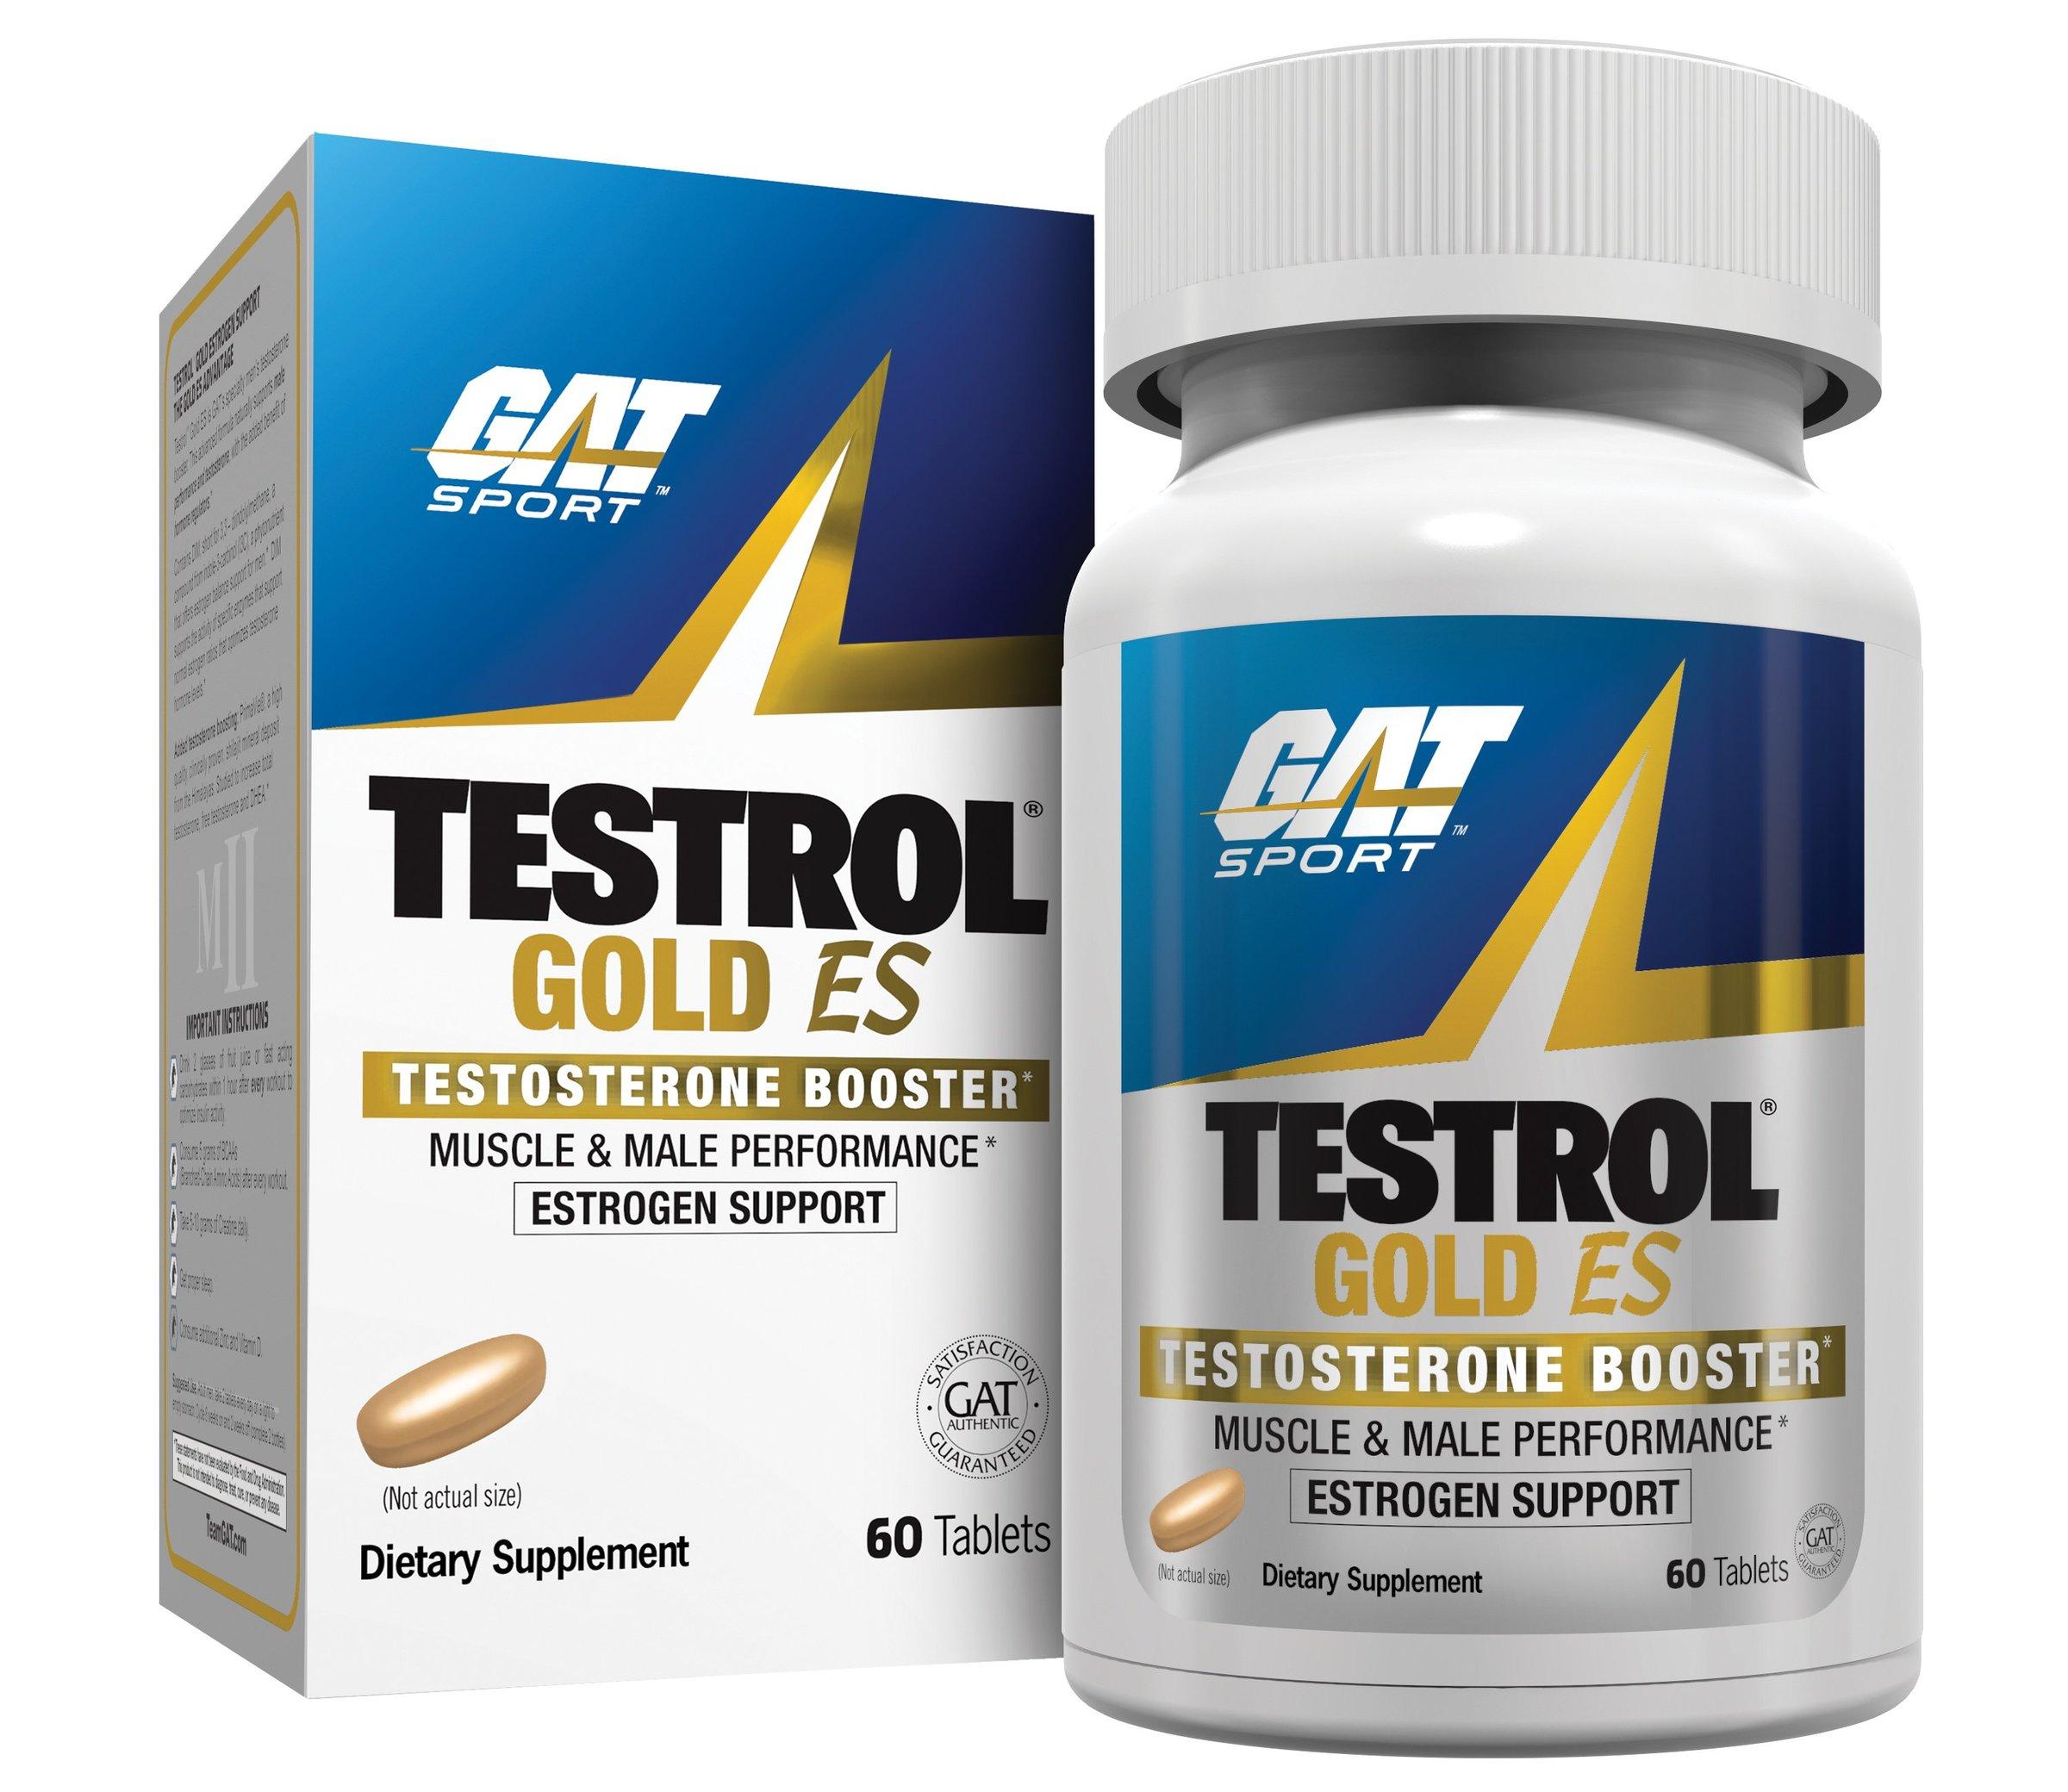 GAT_Sport-Testrol-Gold-BottleBoxCombo@2x.jpg